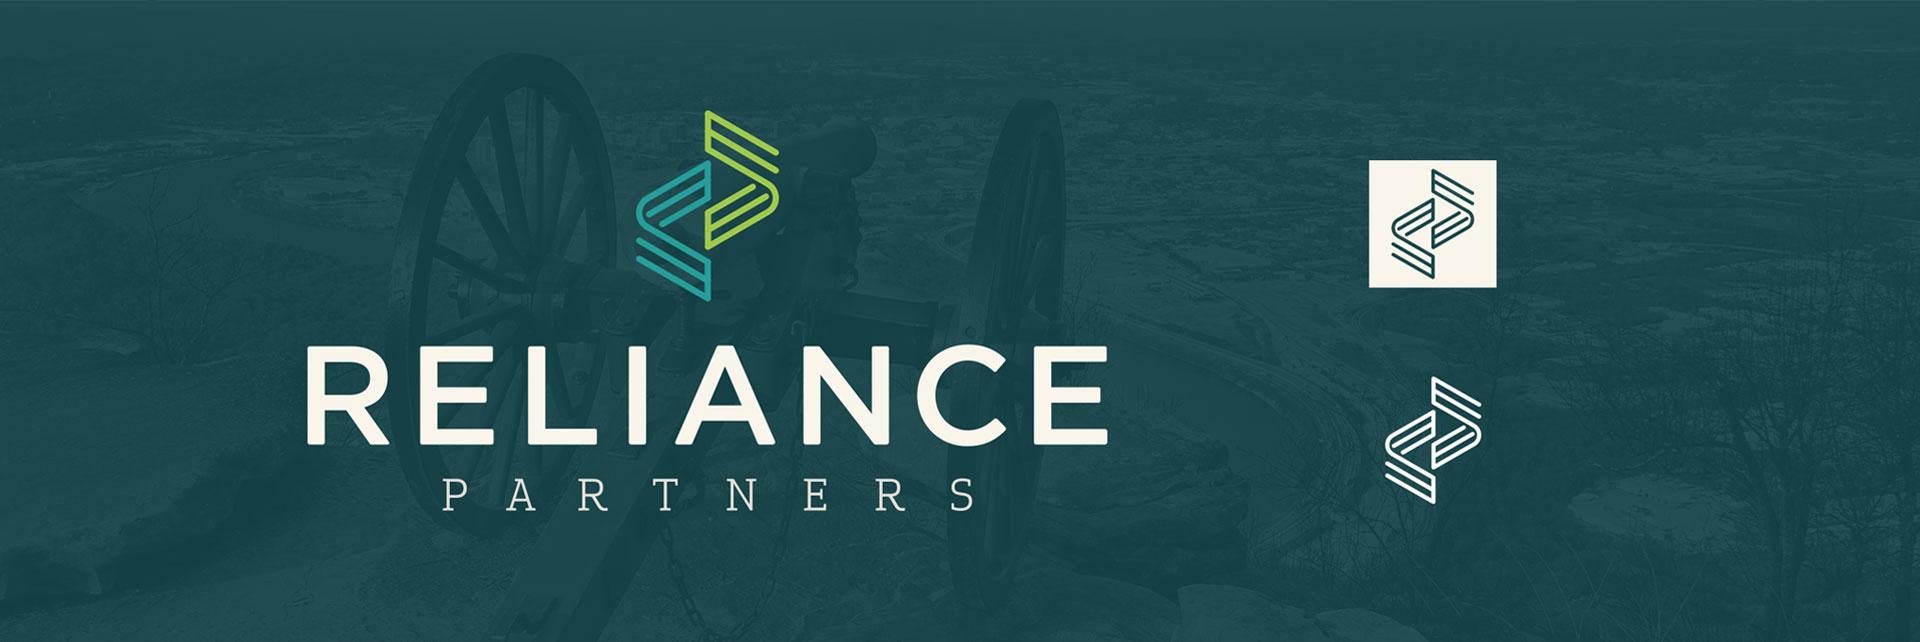 Tiny Giant - Reliance Partners - Identity